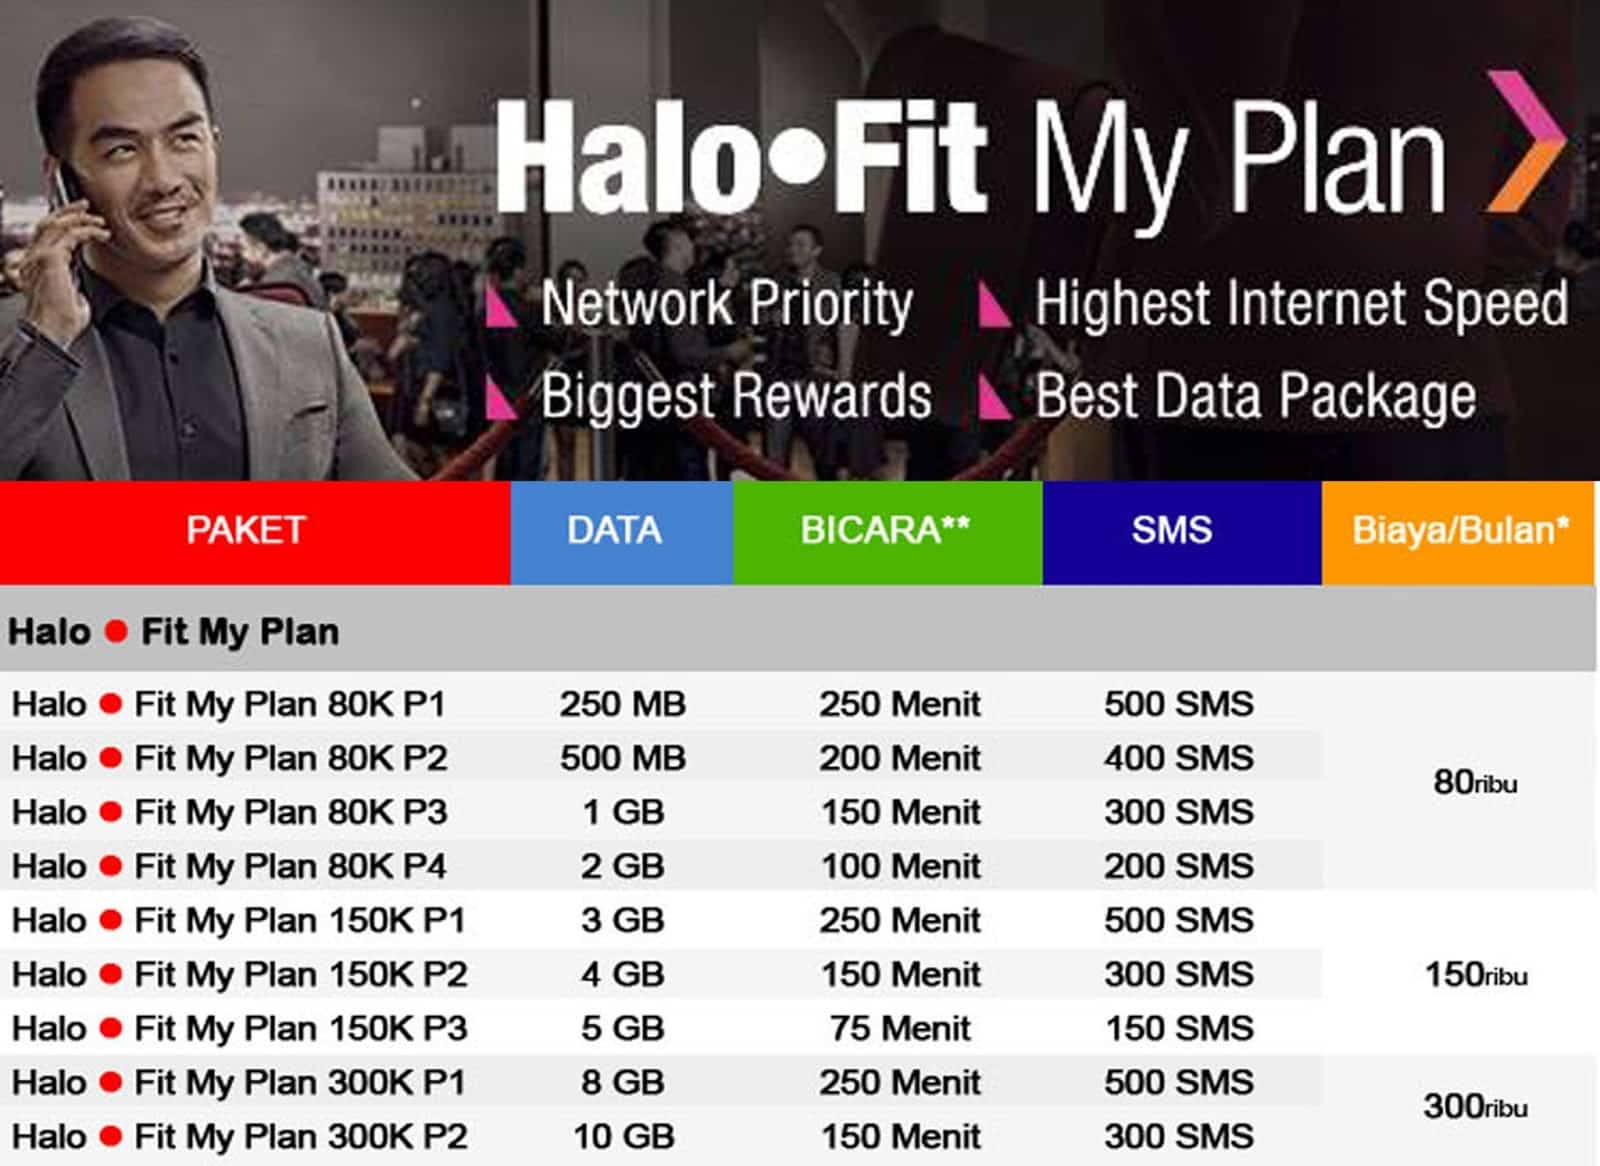 HaloFit-MyPlan-100000